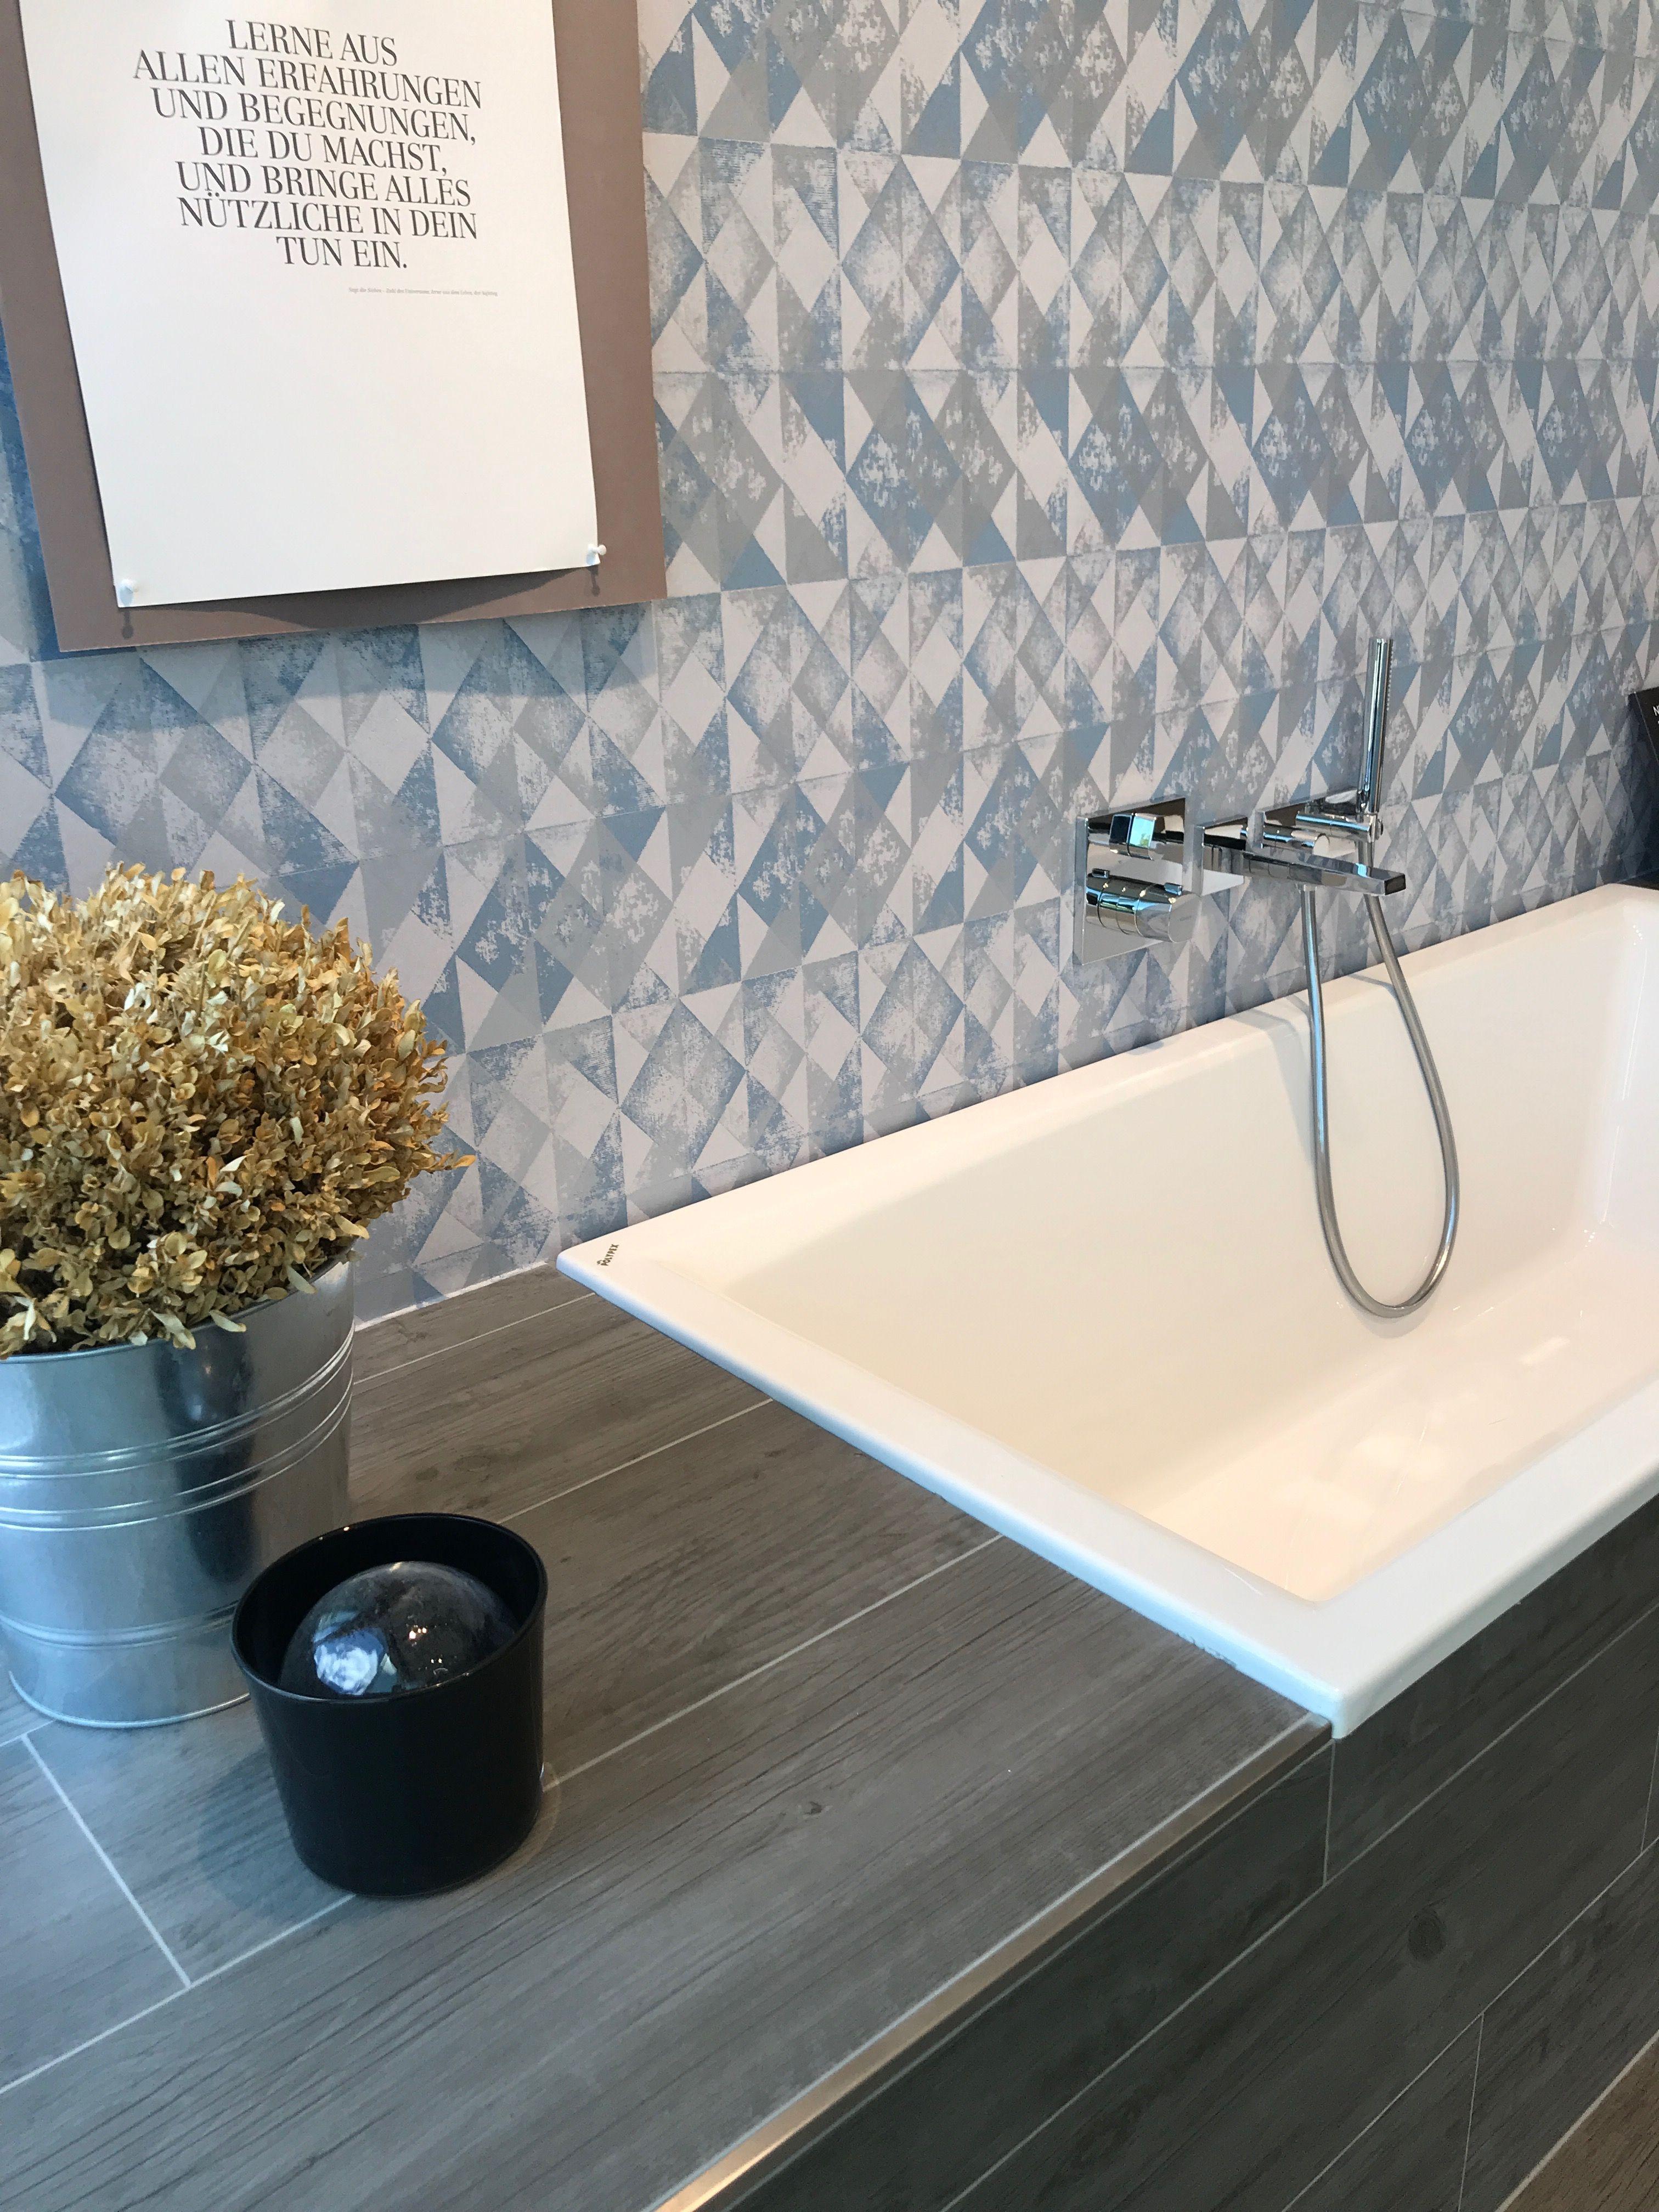 Decoration In The Bathroom Slogans Beautiful Tiles Plants